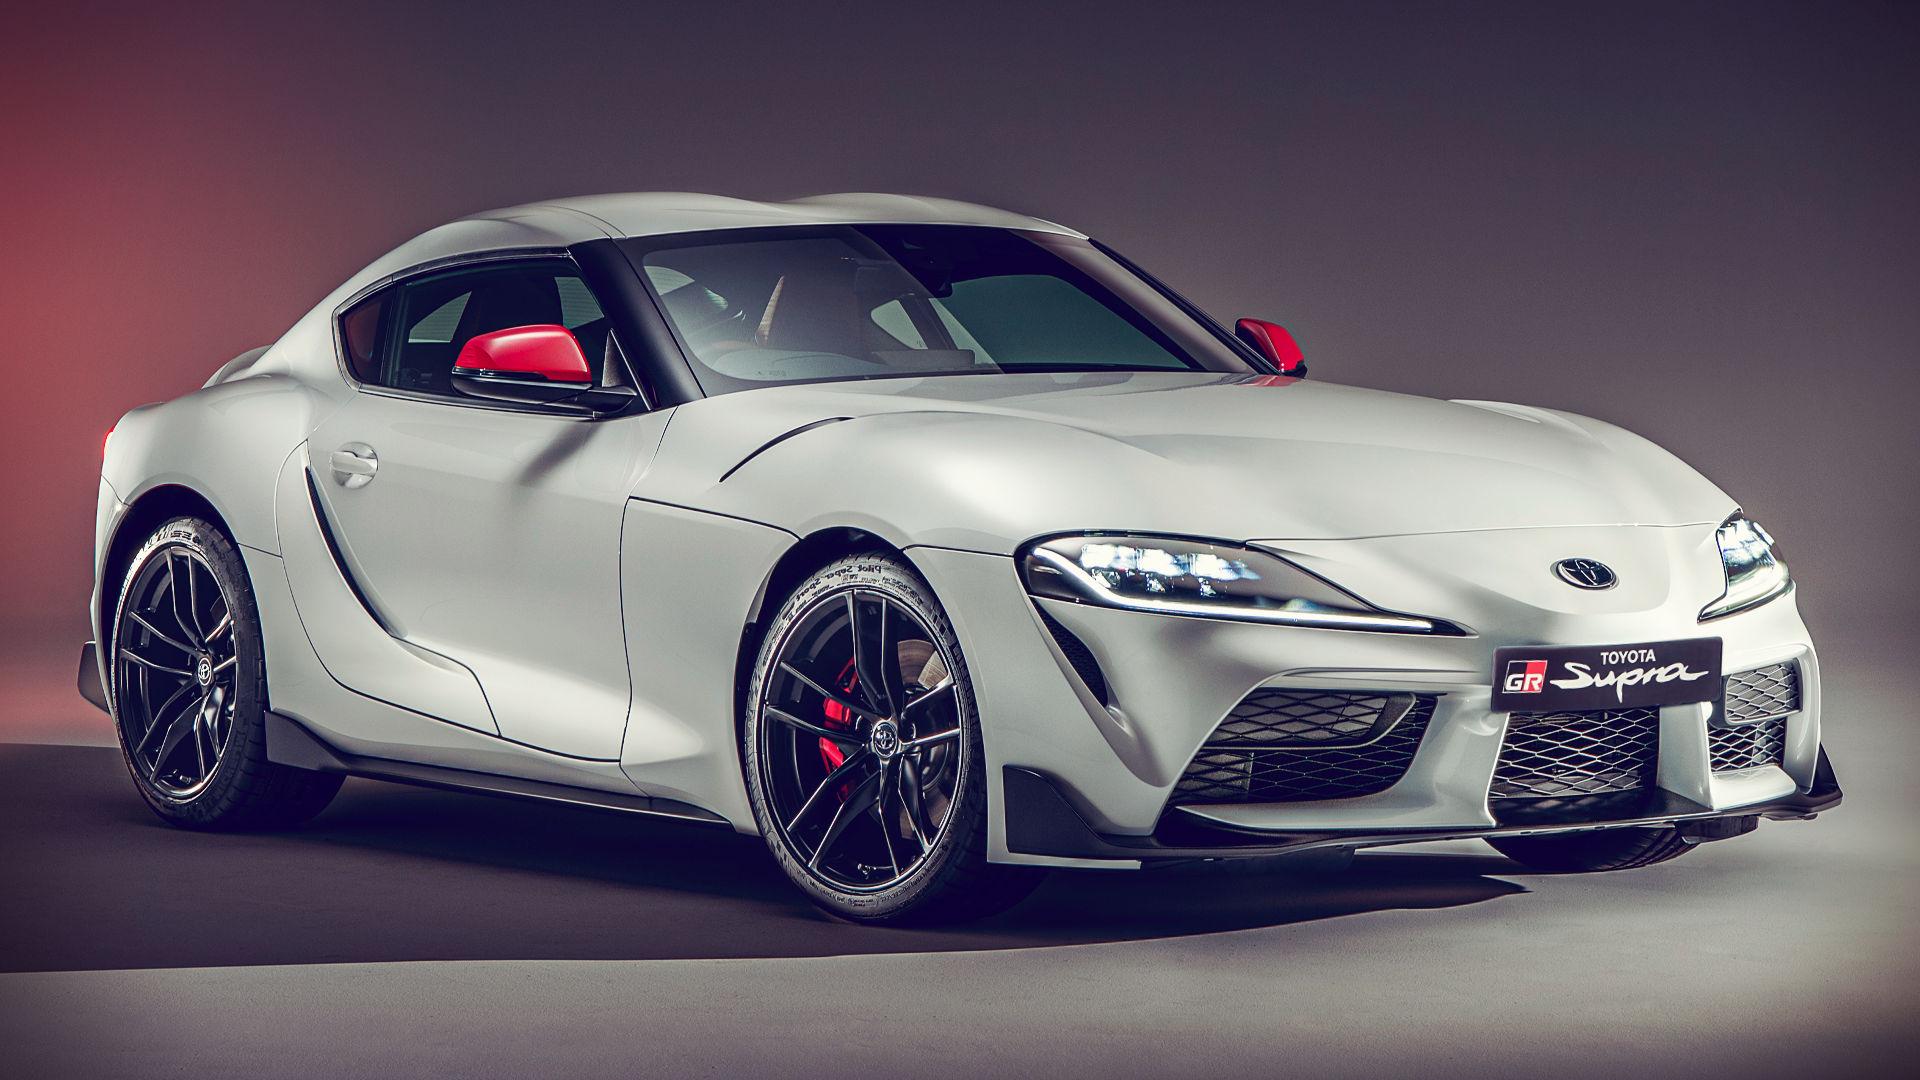 Toyota Supra 2.0L Turbo 2020